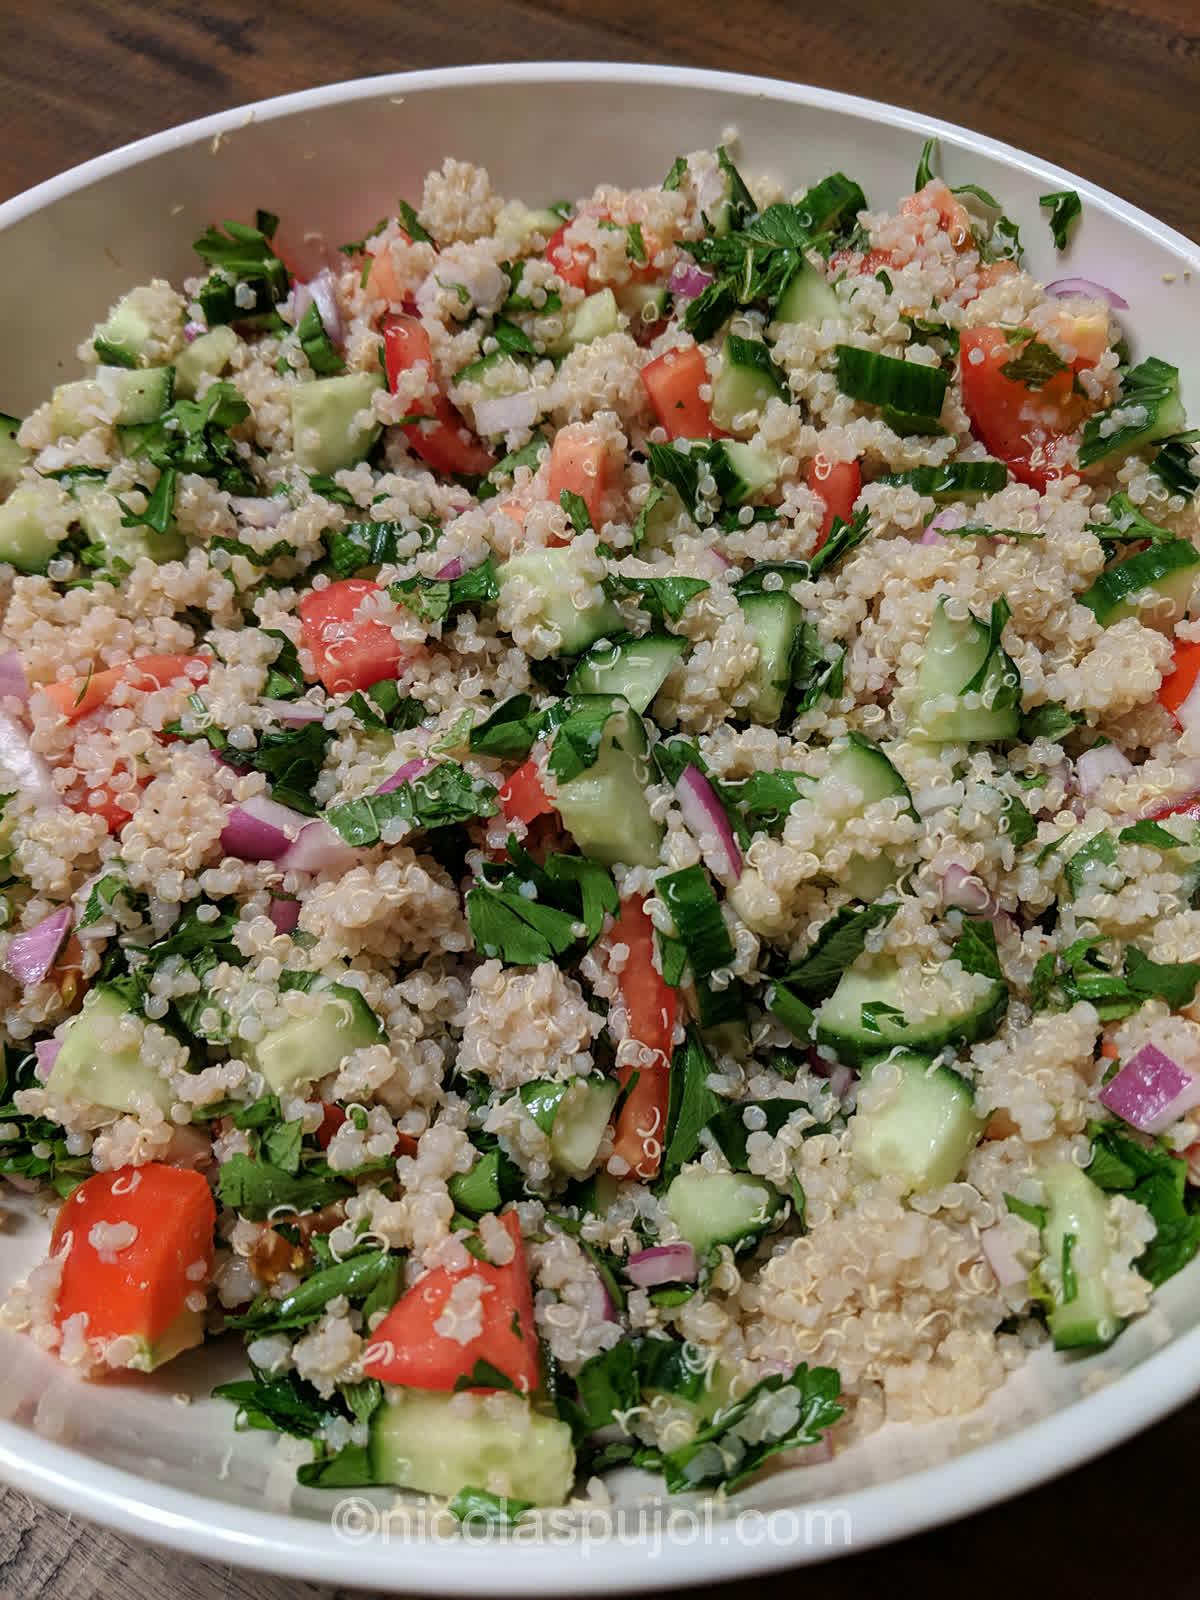 No Oil Quinoa Tabouli Tabbouleh Salad Salads Nicolaspujol Com,Pork Loin Country Style Ribs Boneless